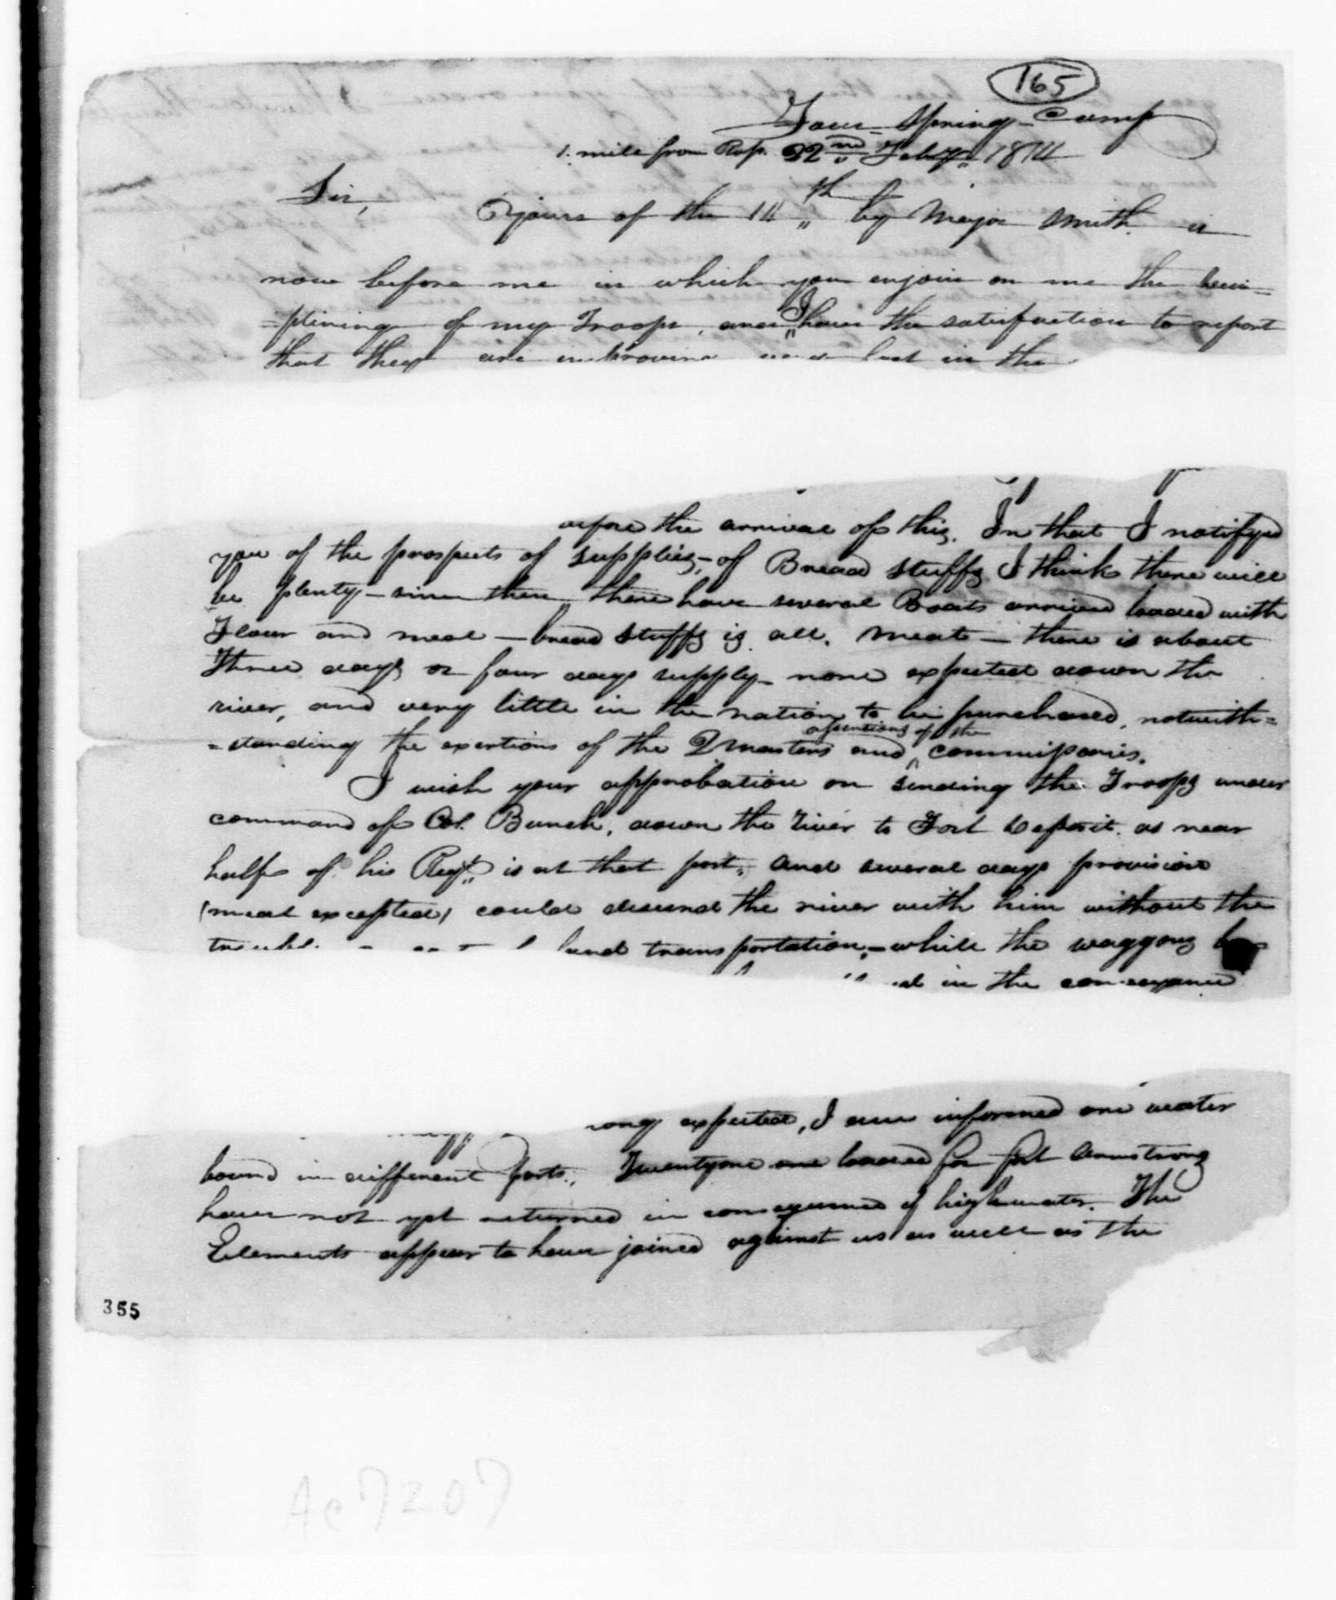 George Doherty to Andrew Jackson